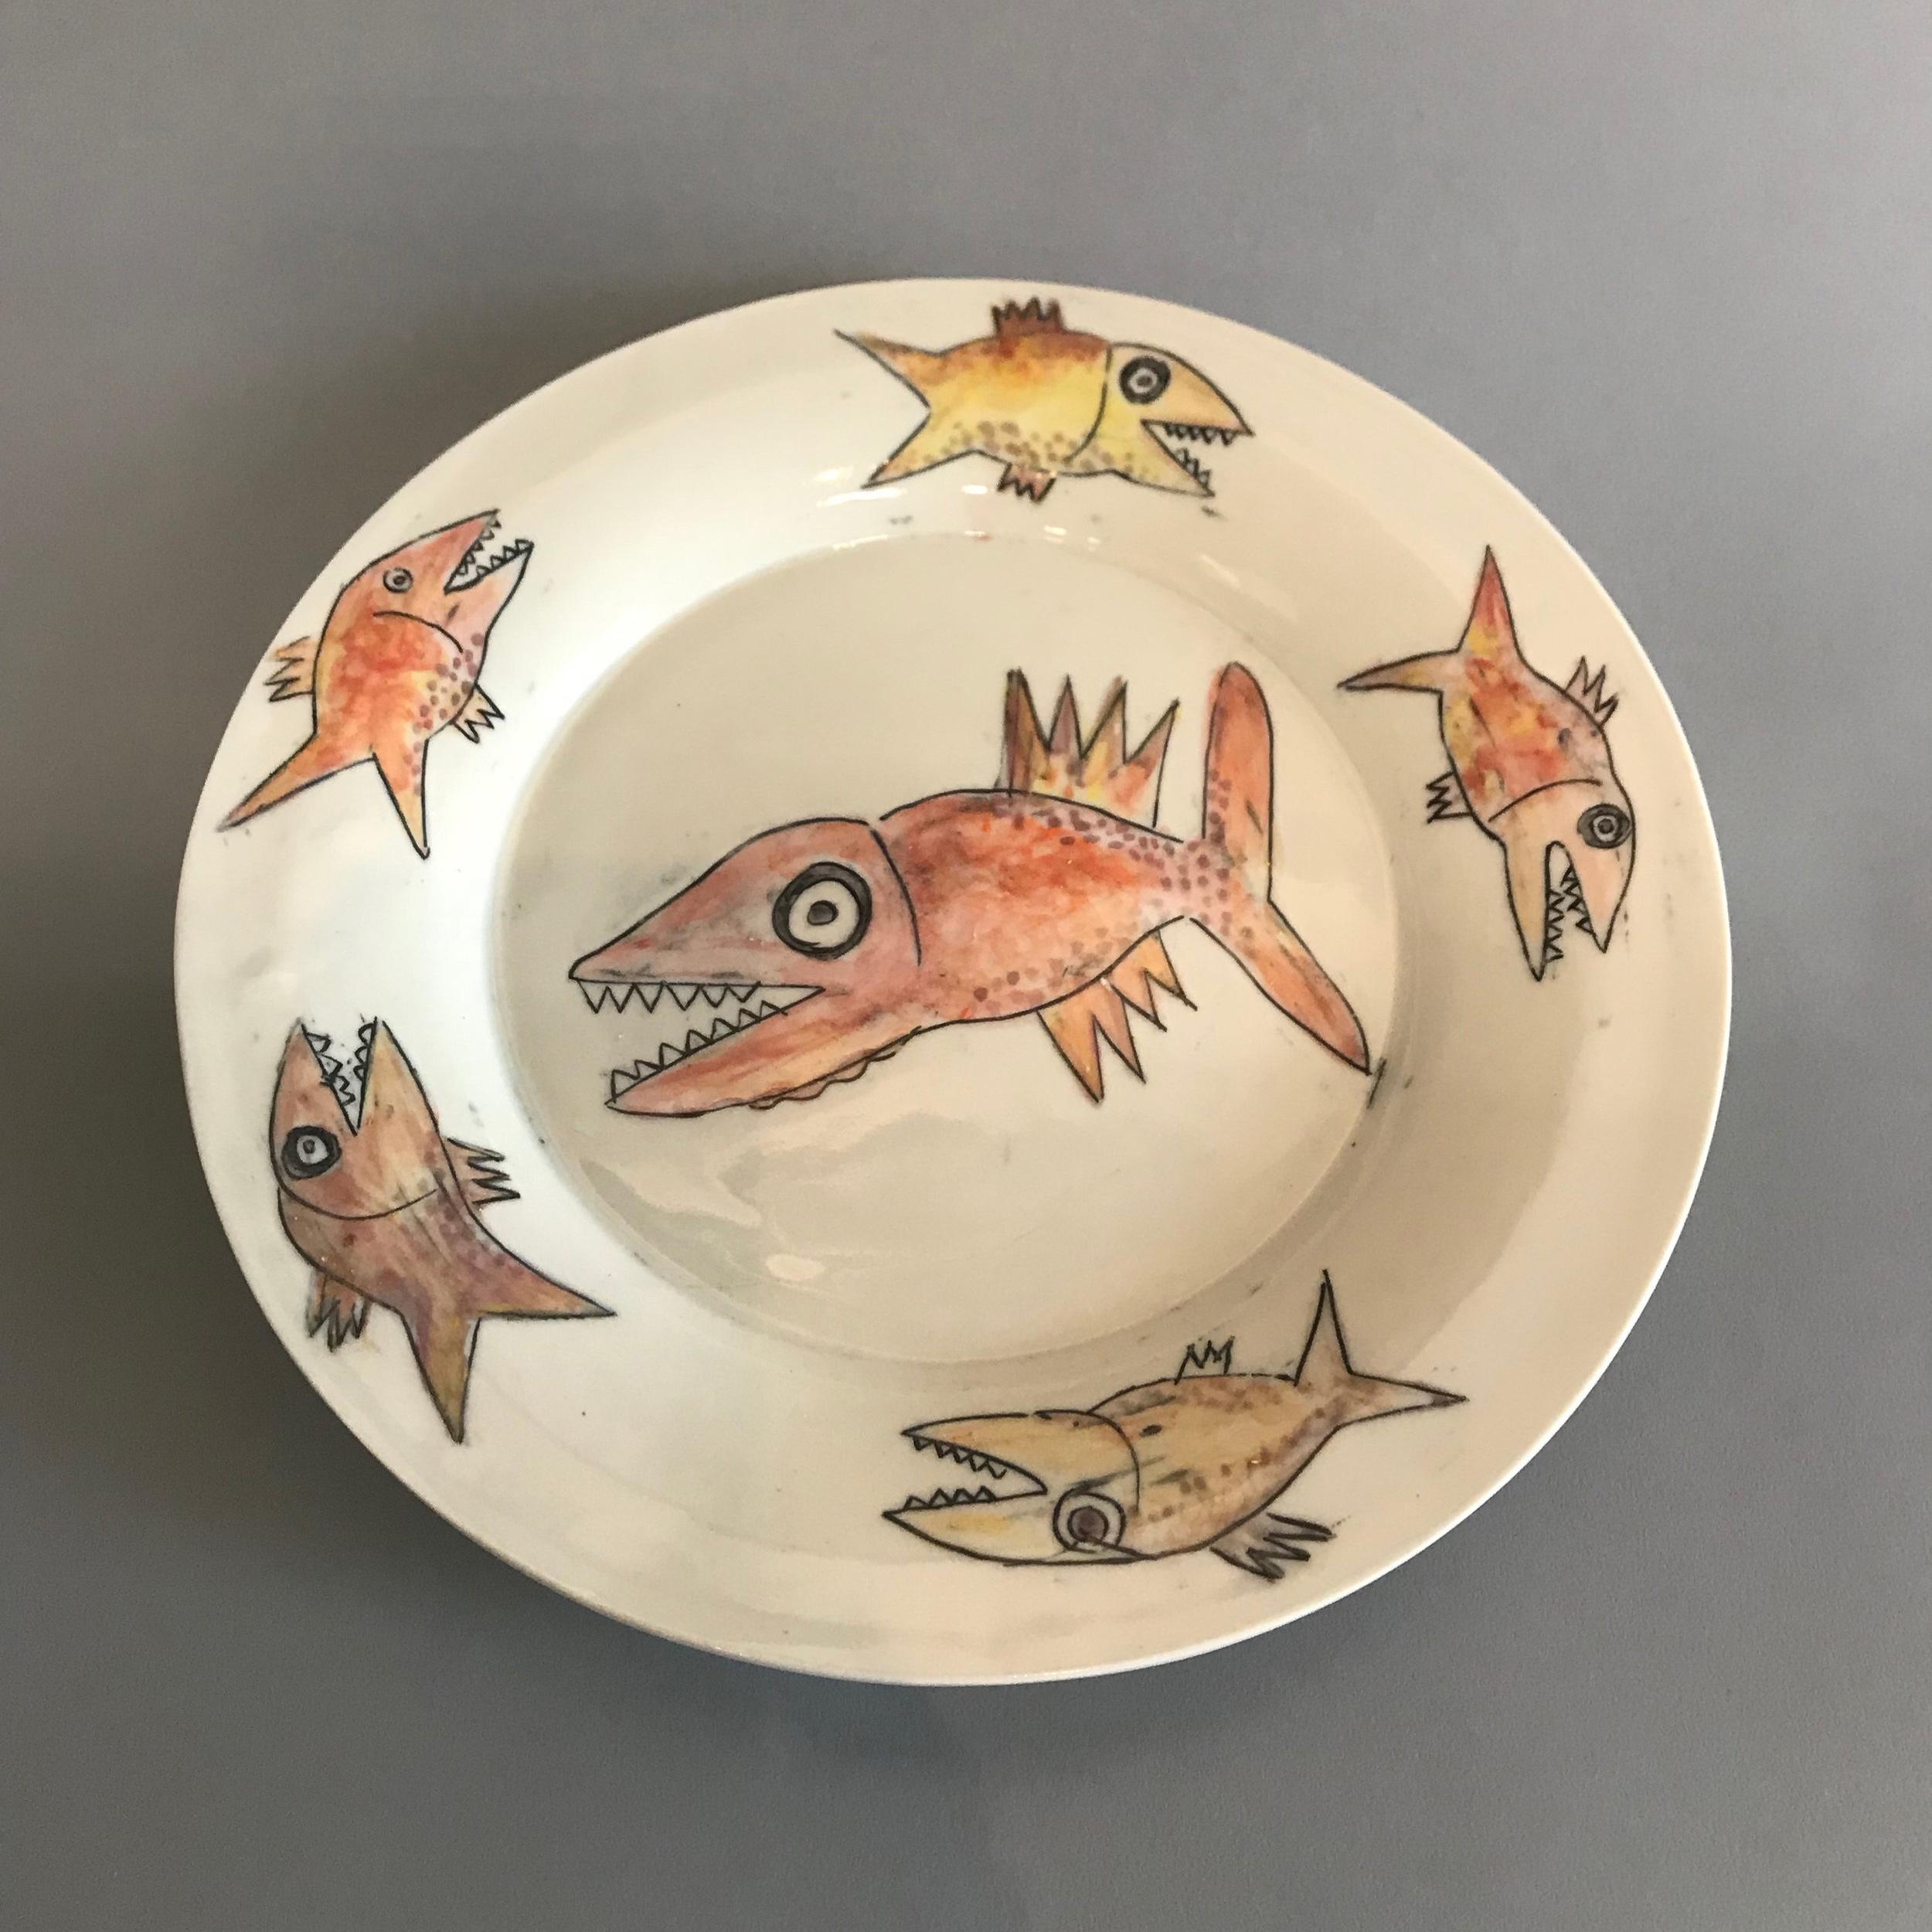 Fish Plate (10%22).jpg